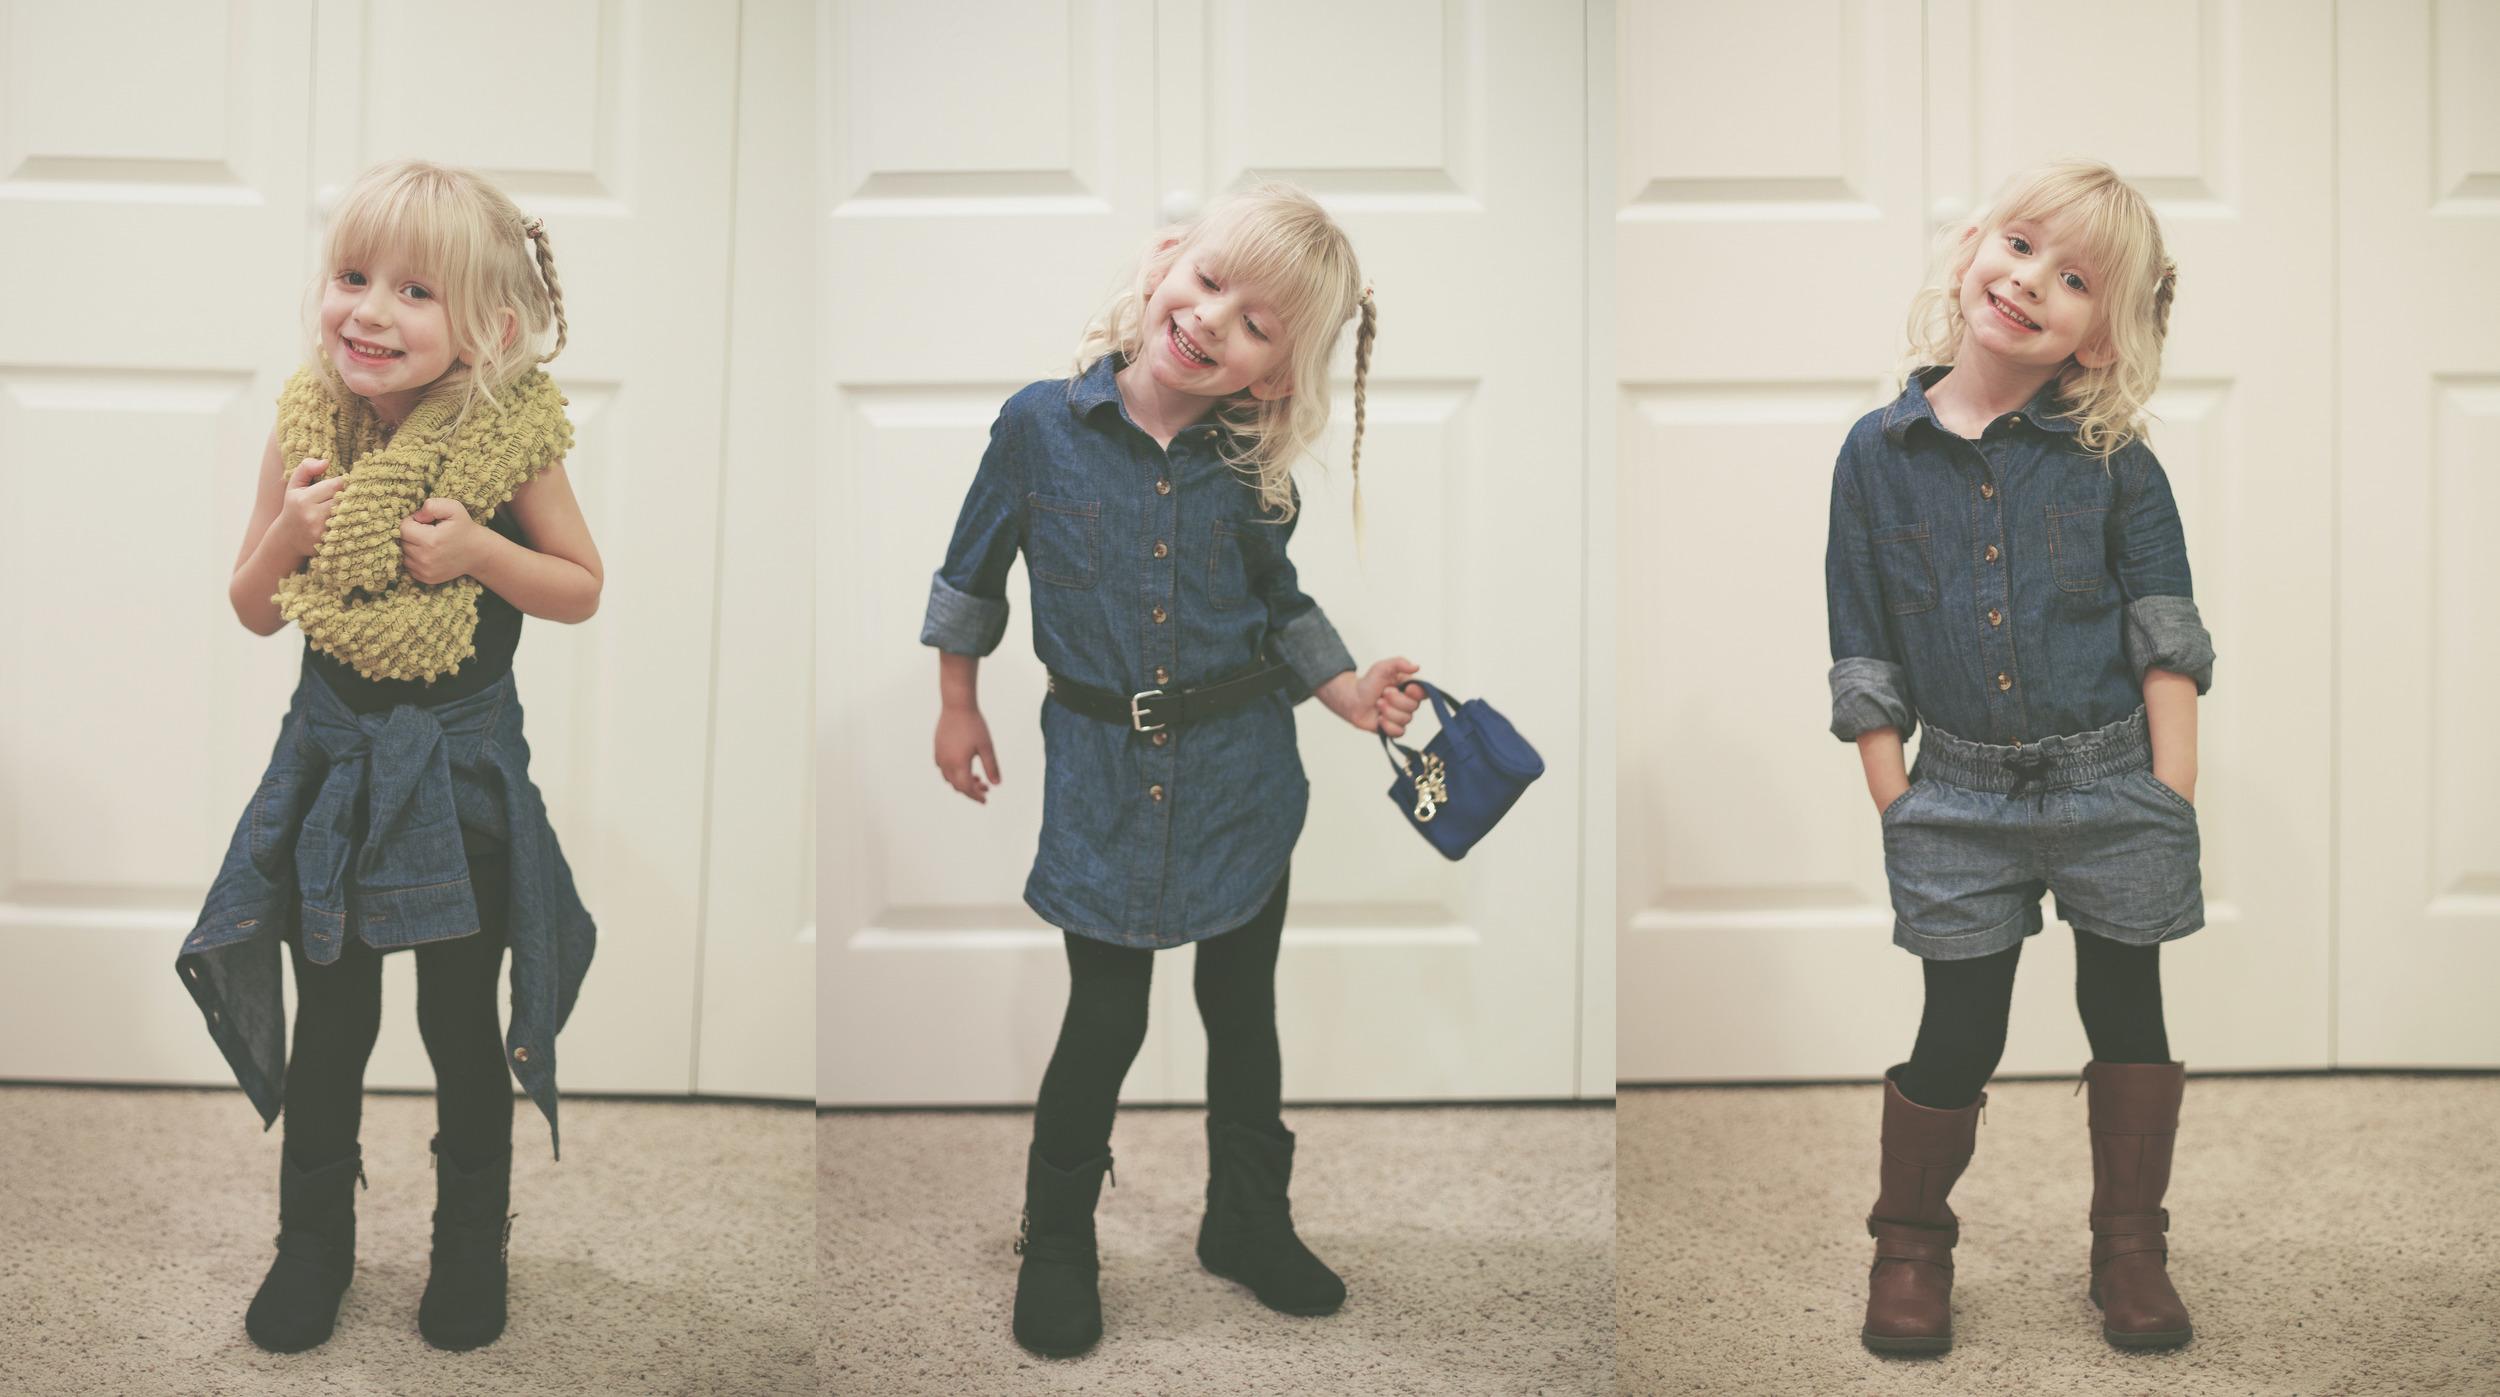 Scarf - Laundry             //           Black Boots - Wal-Mart           //       Denim Shorts - Baby Gap